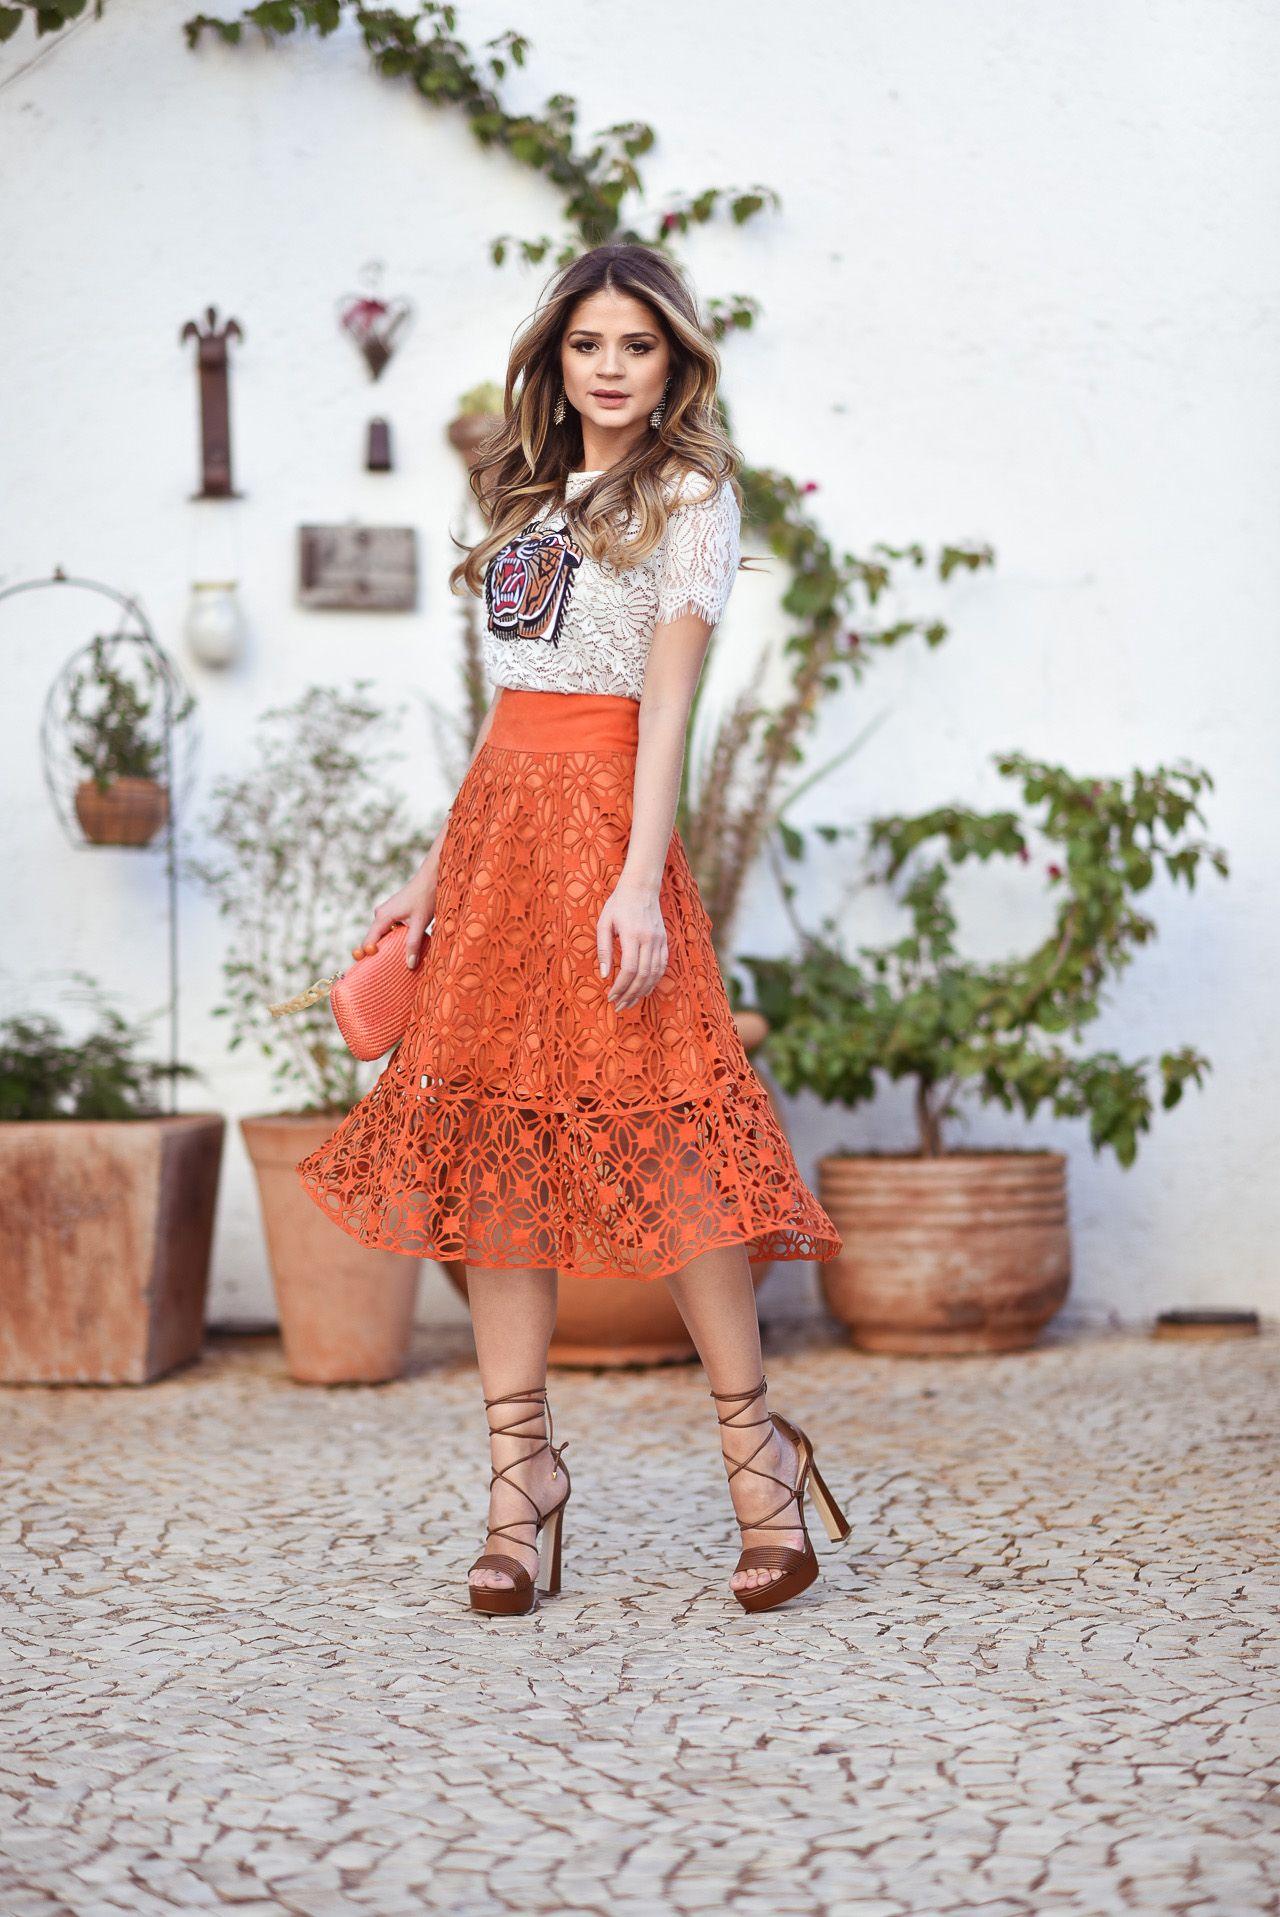 987bb5dfe5 Look Tássia Naves com saia midi laranja e blusa bege